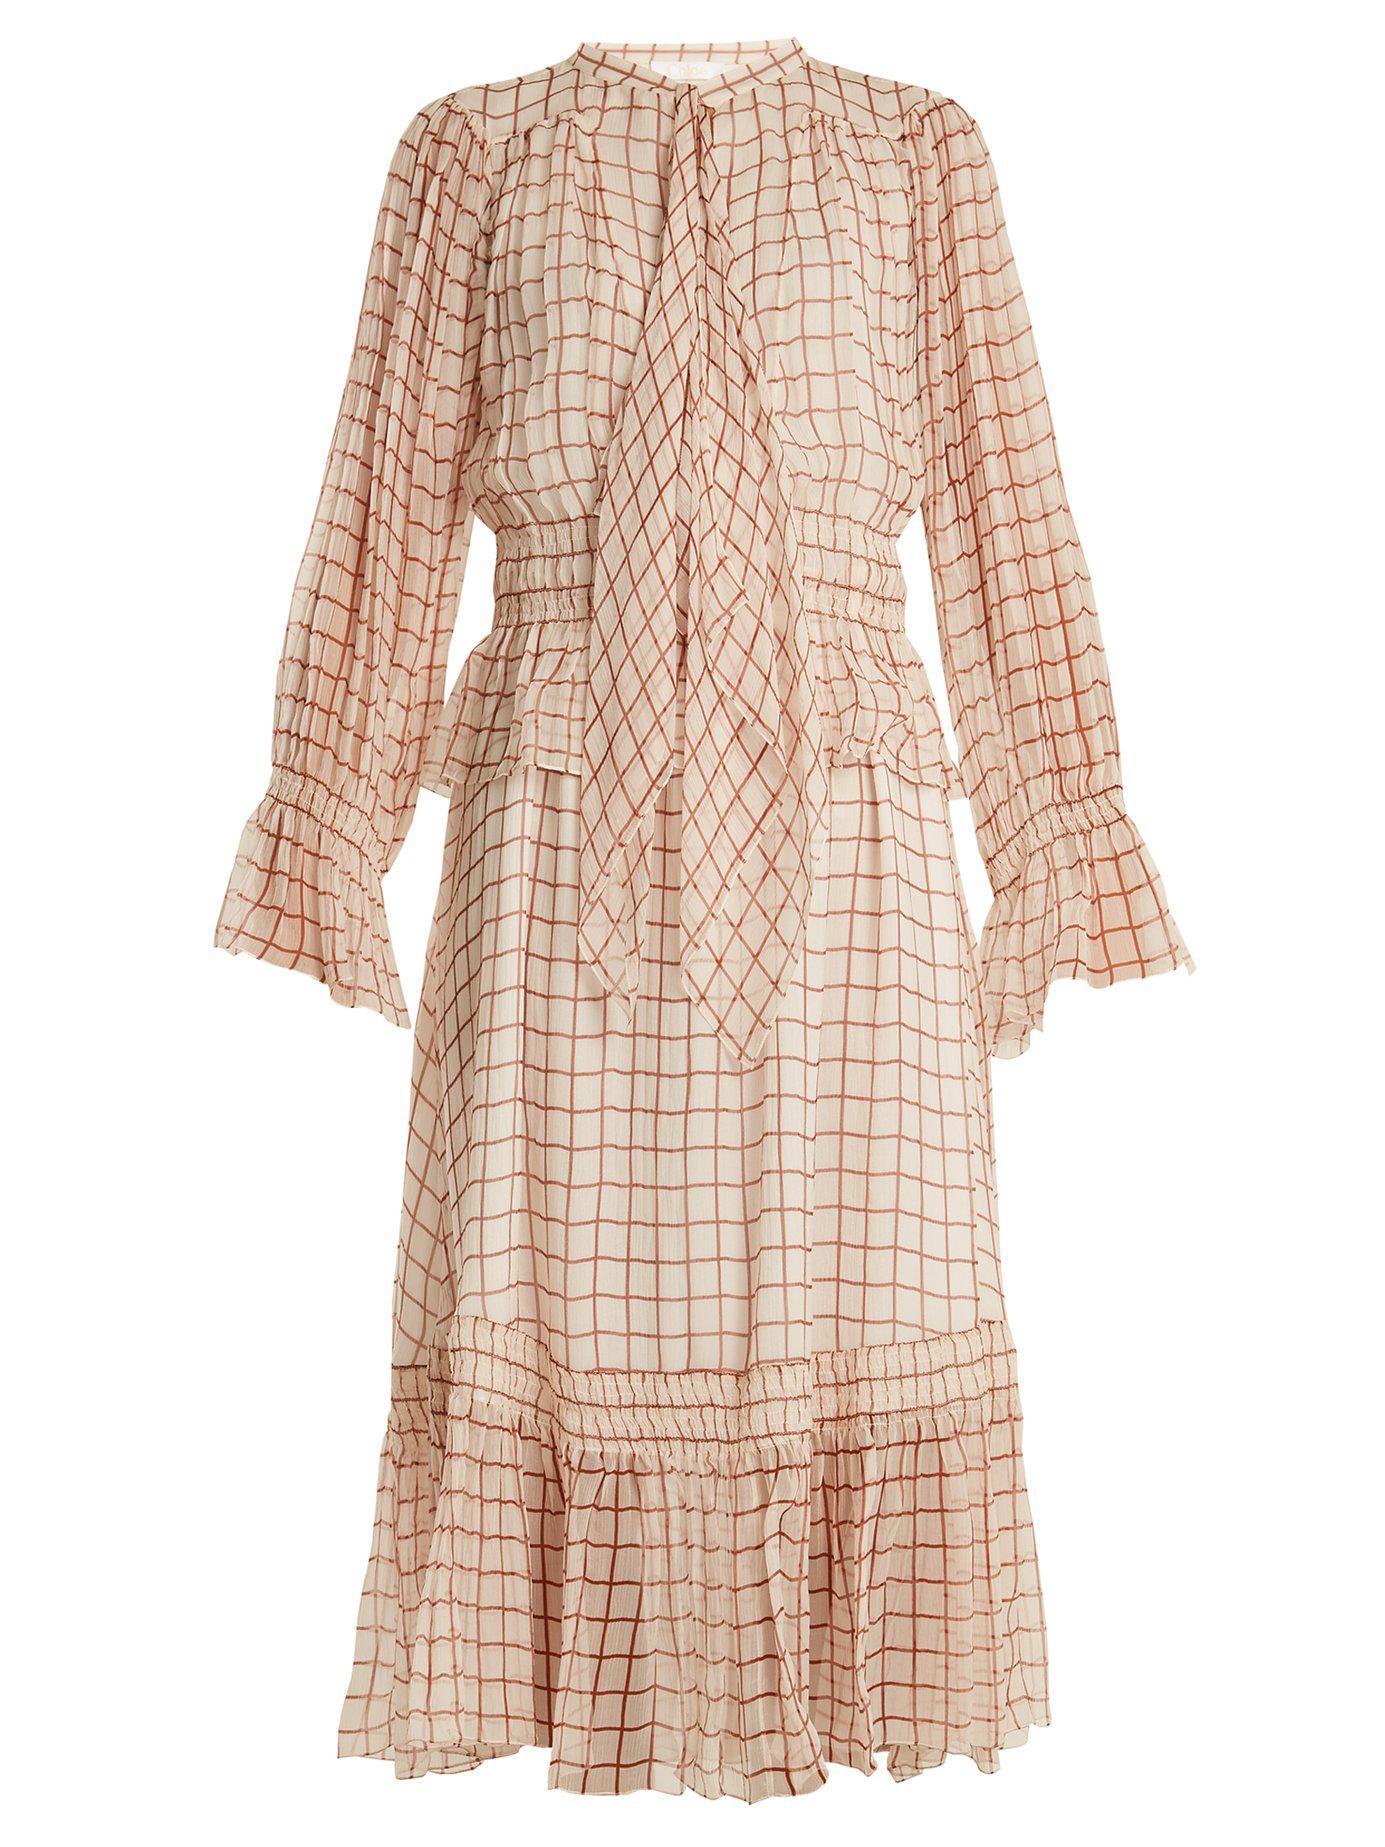 Grid-print silk-georgette midi dress Chloé Buy Cheap Limited Edition 2iP9CJ16